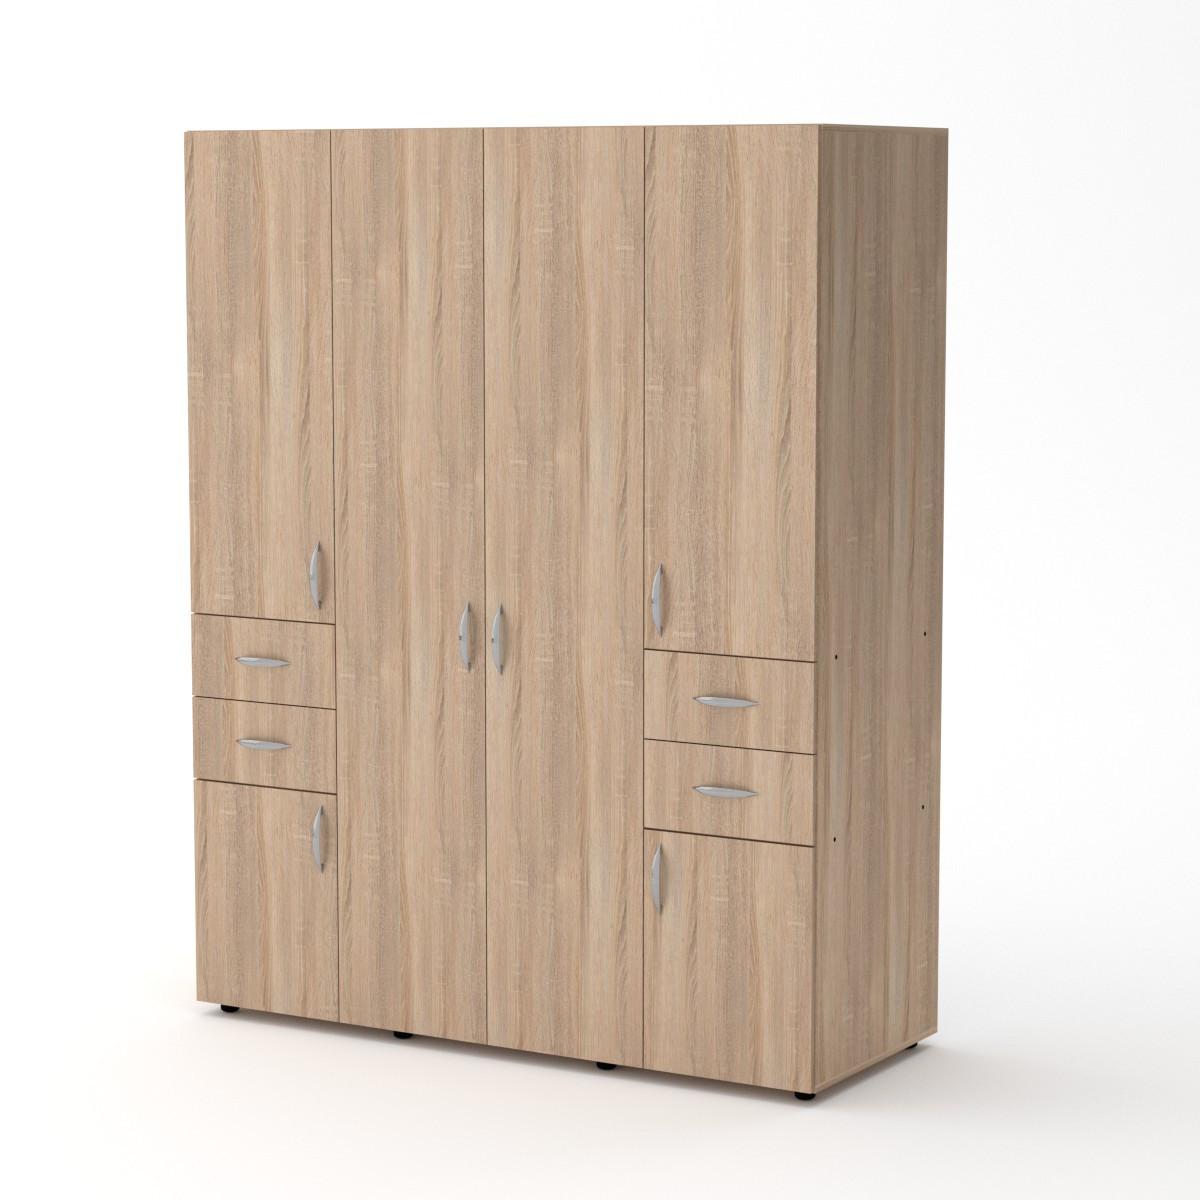 Шкаф-20 дуб сонома Компанит (160х62х203 см)